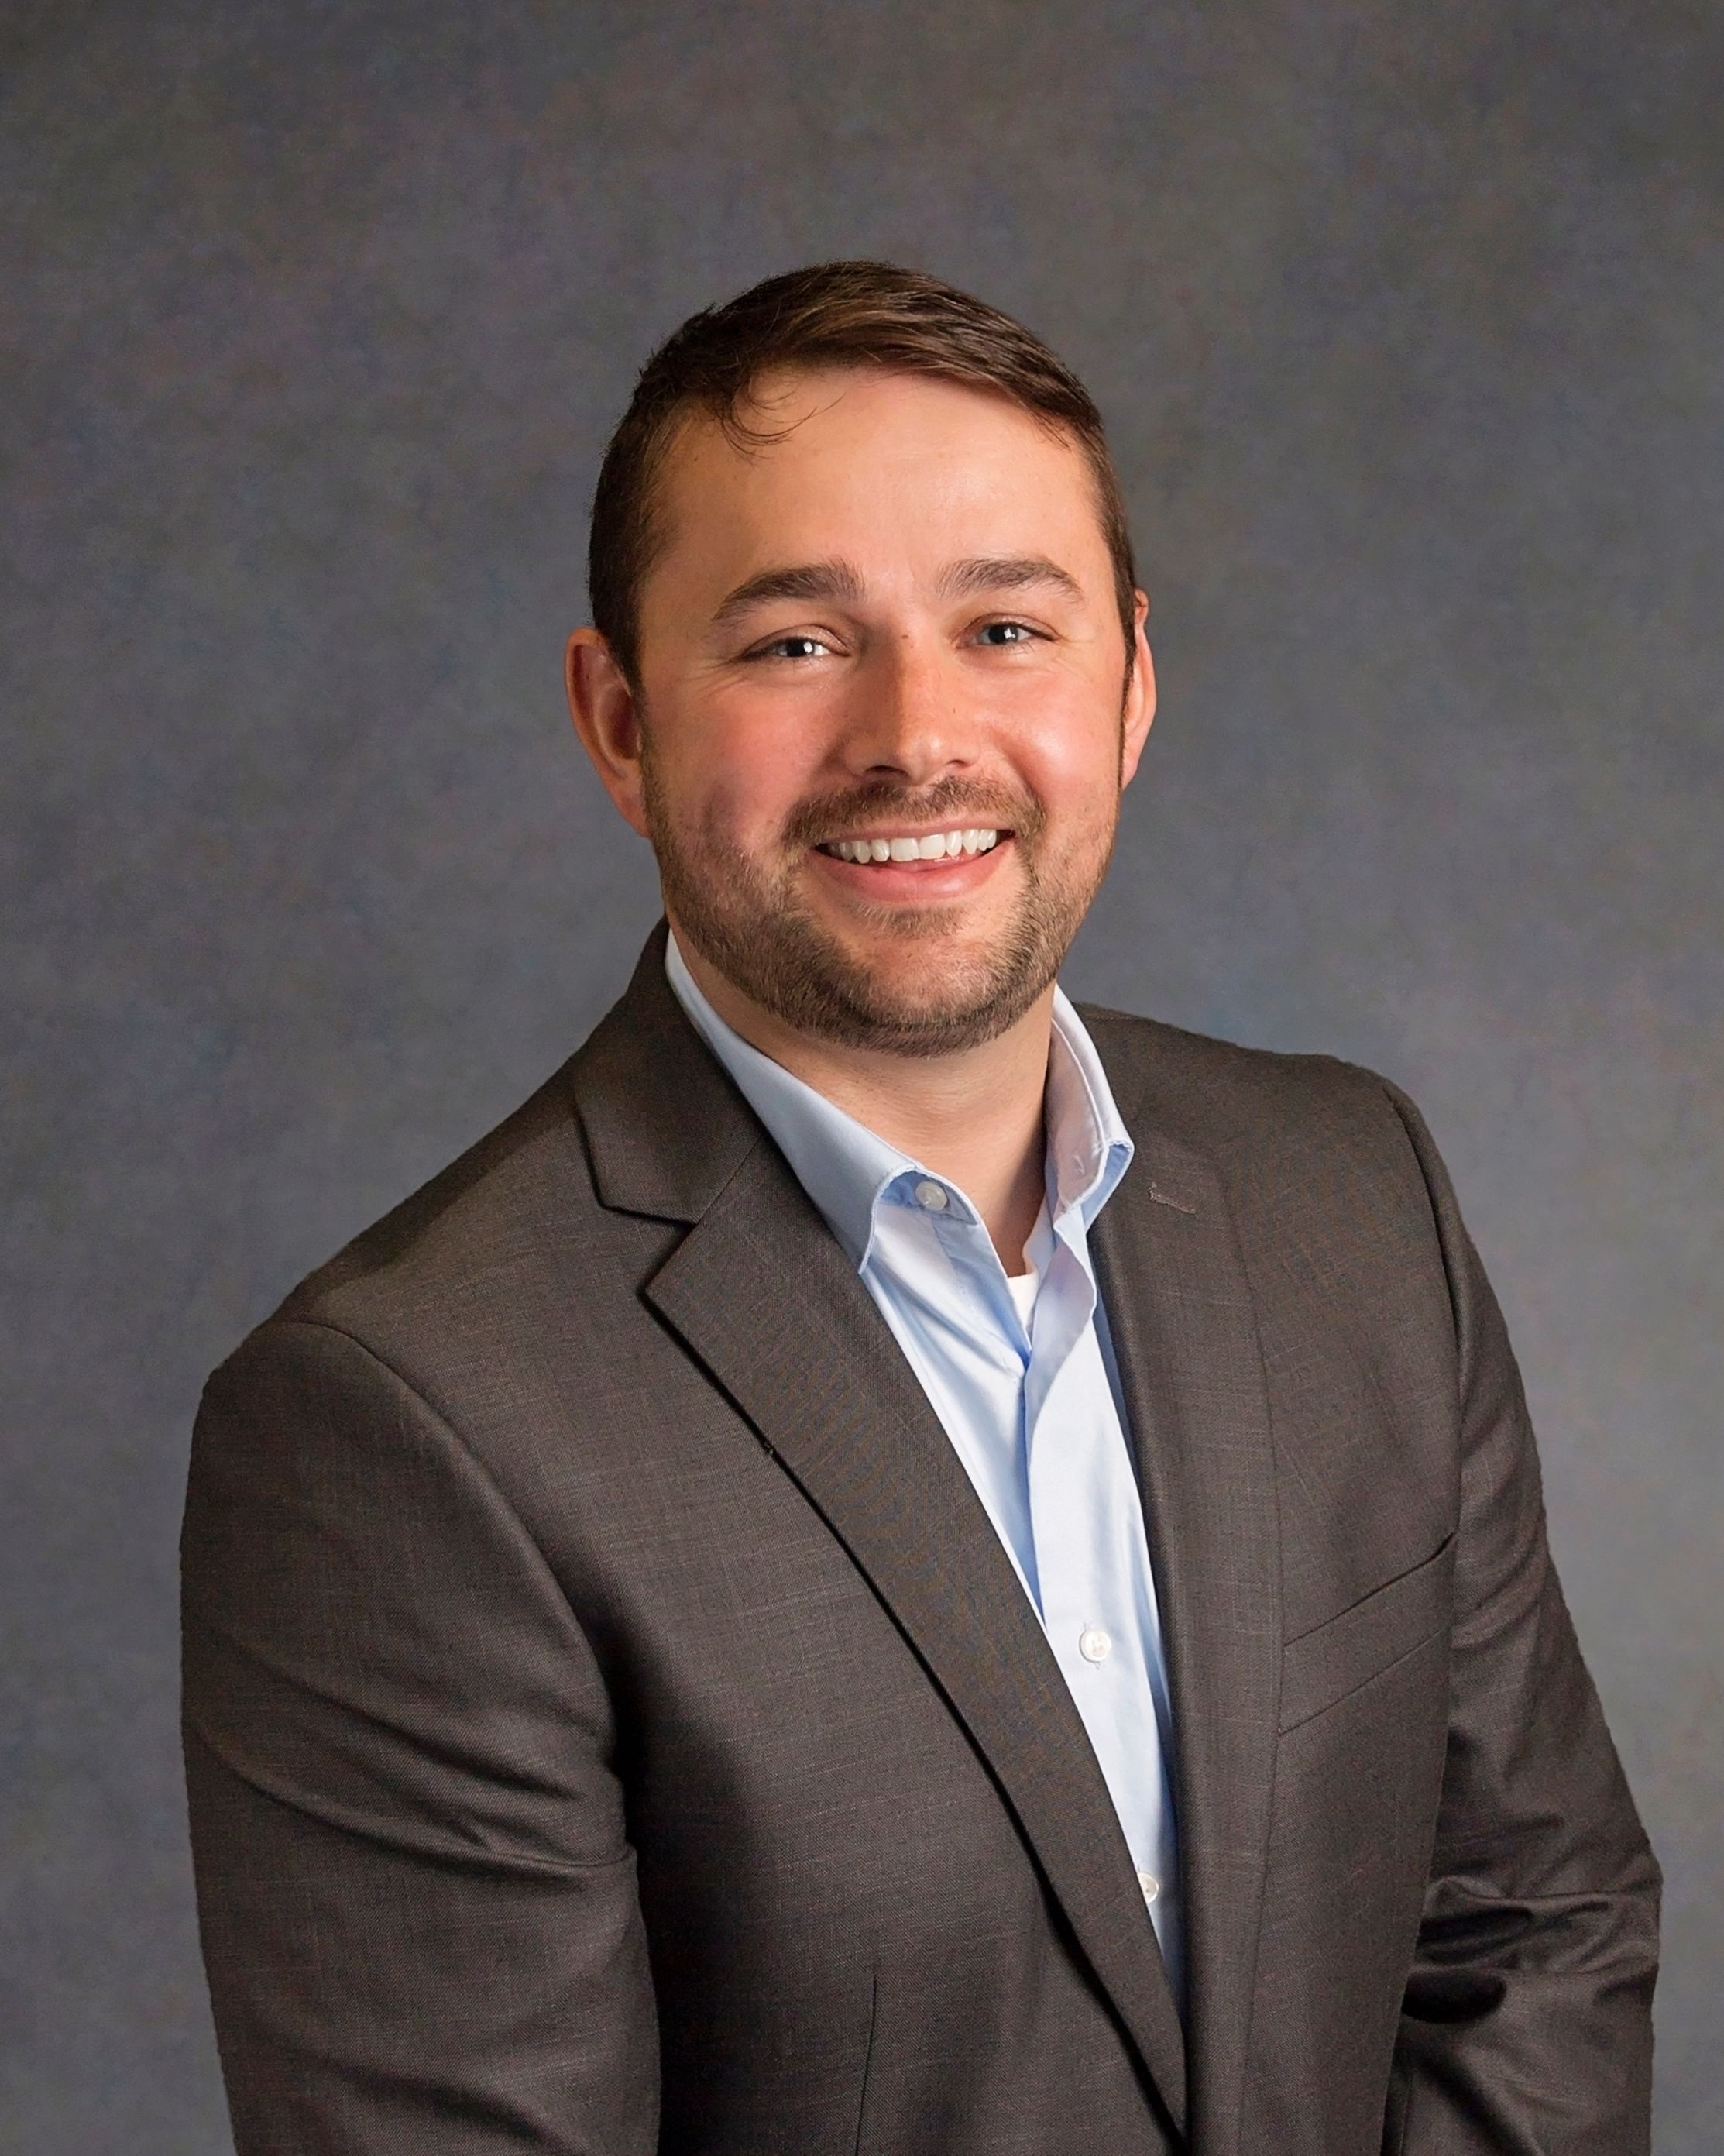 Cory Creighton, Board Vice chair